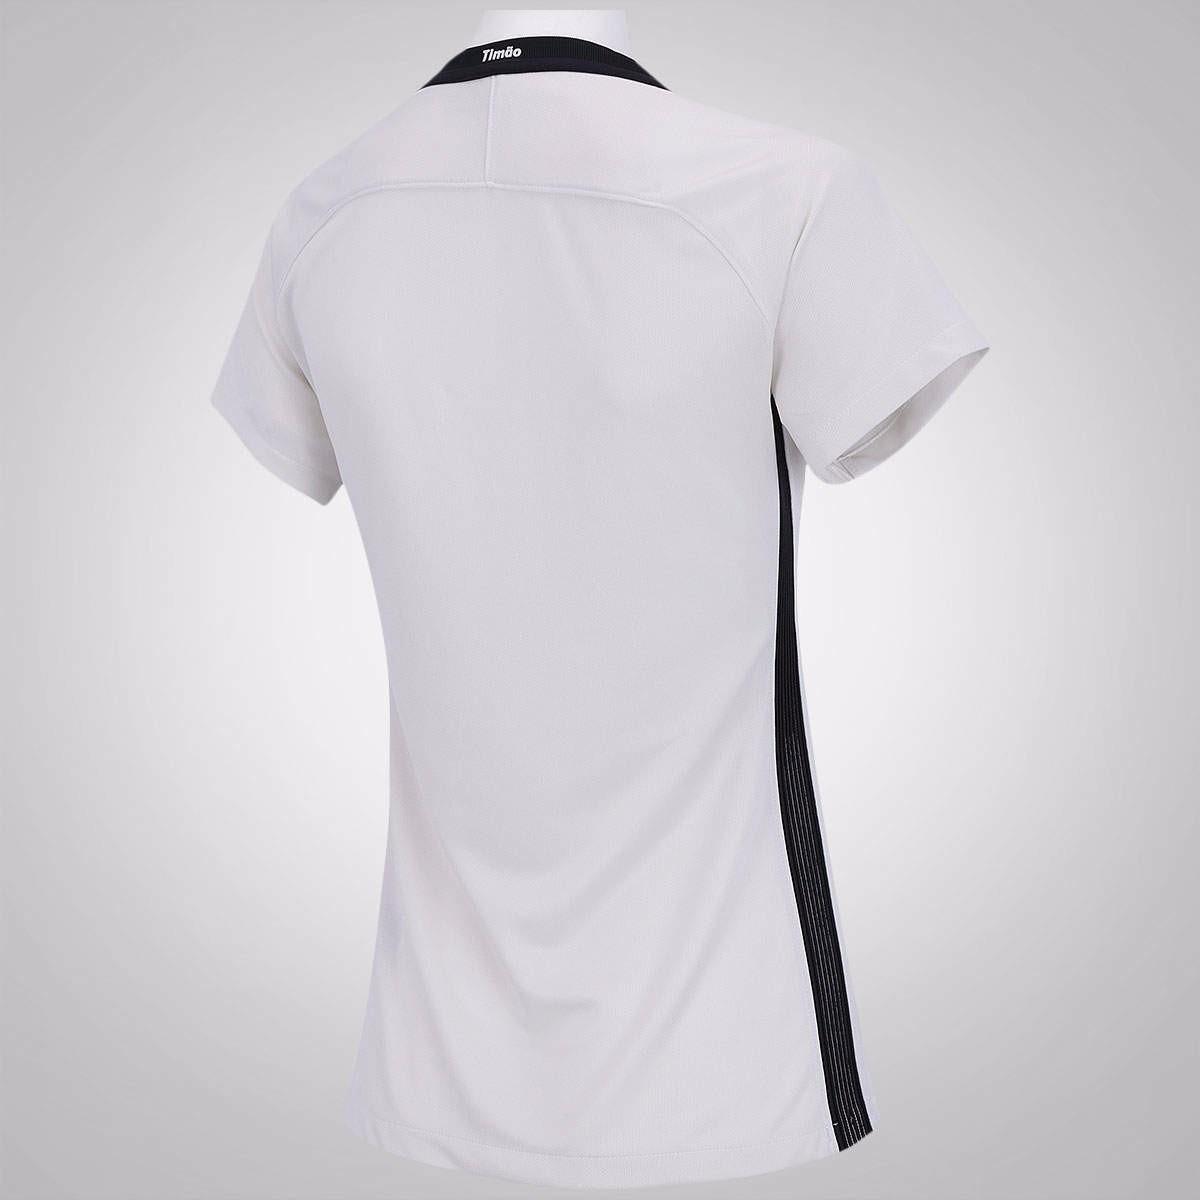 3ded7ccbfb camisa nike corinthians 2016 torcedor - feminina. Carregando zoom.